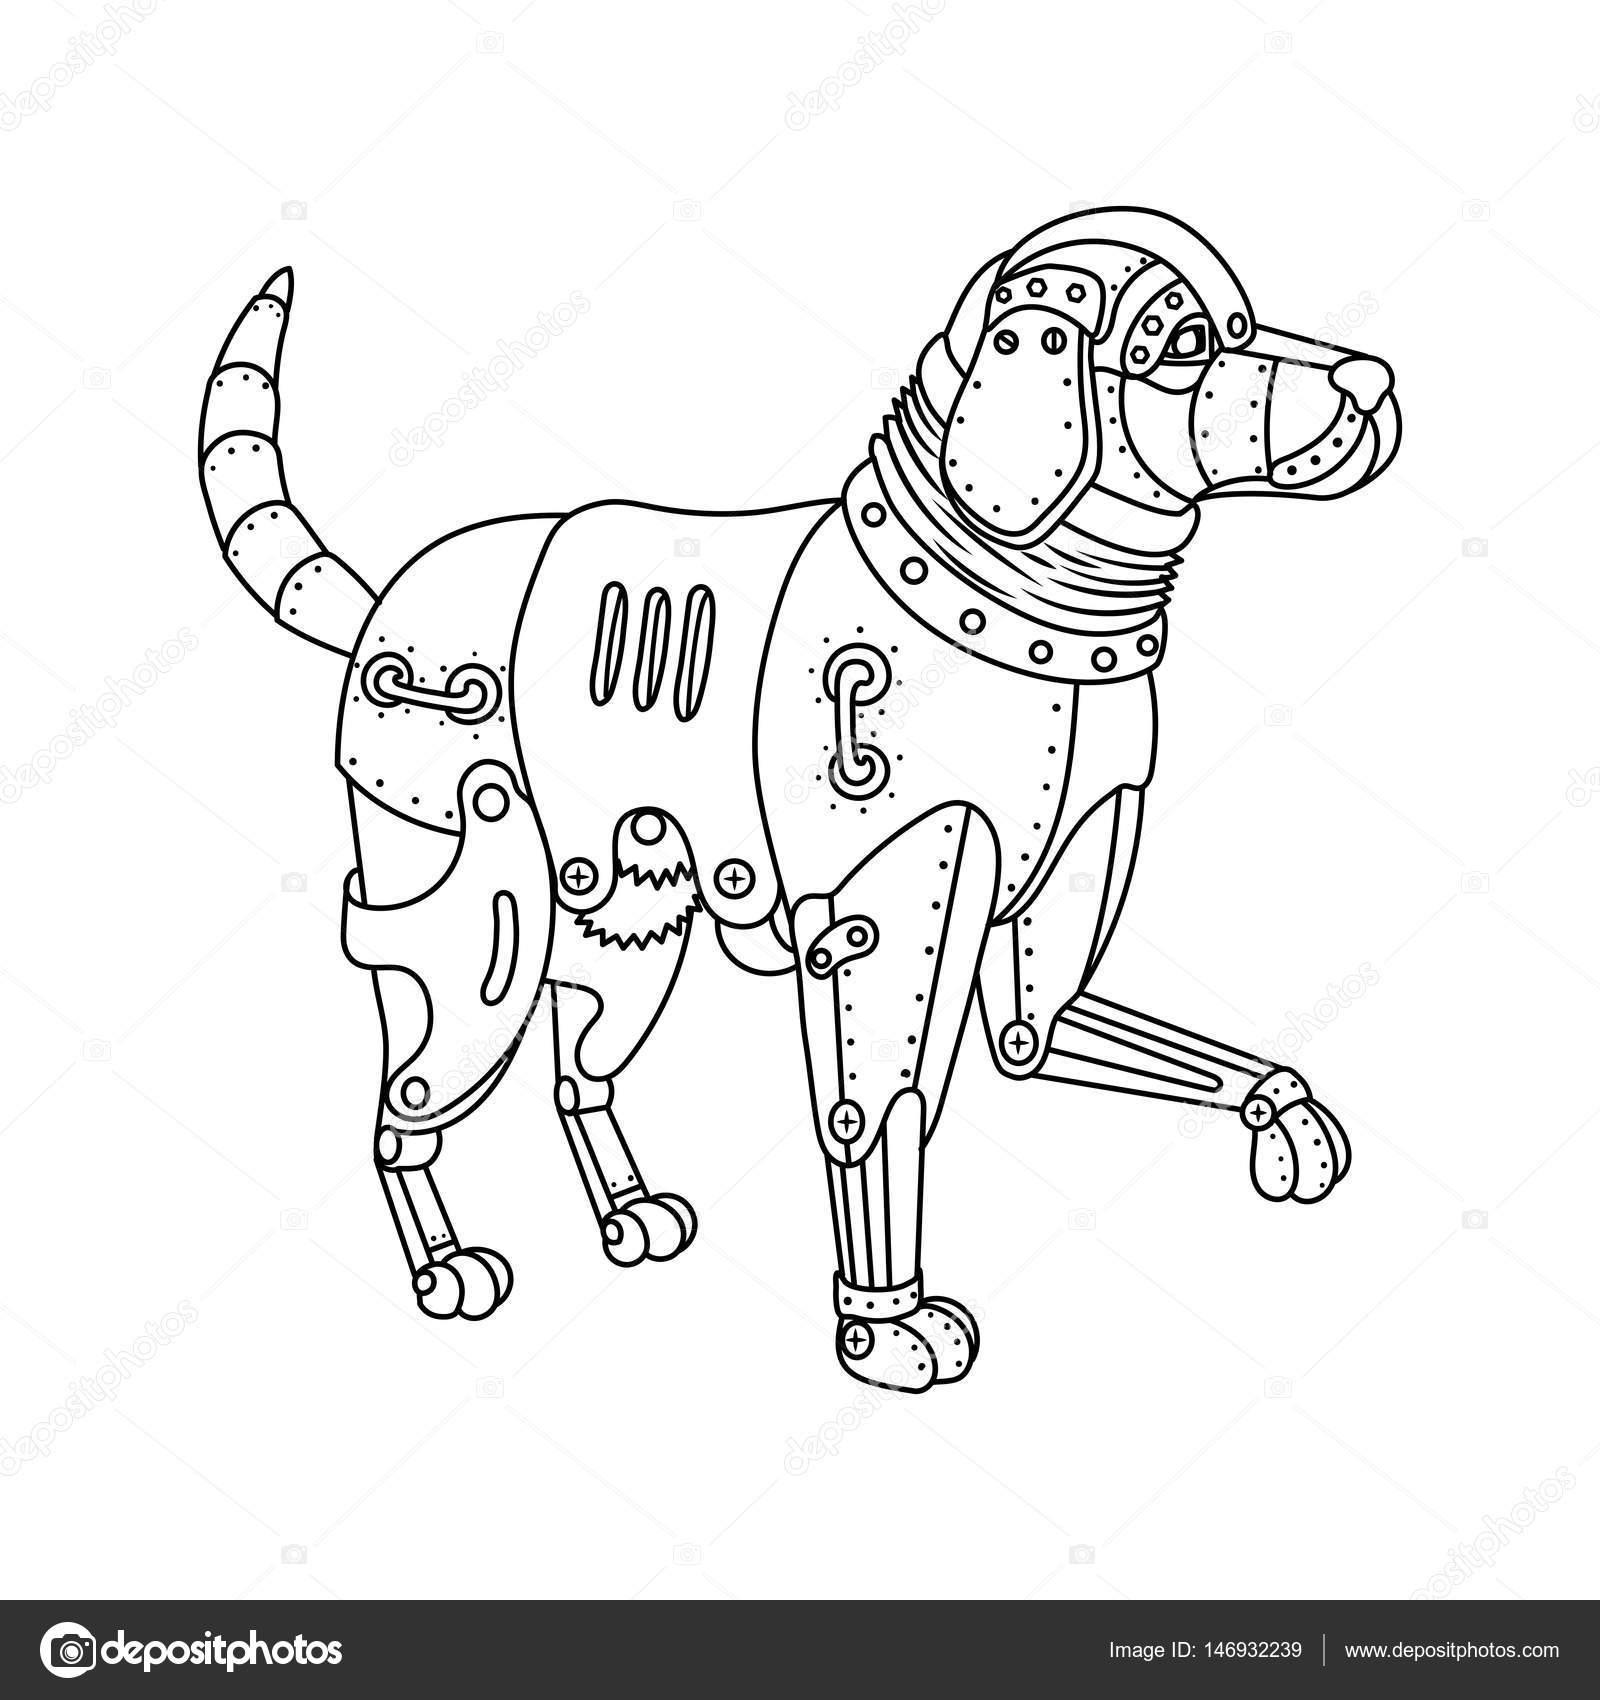 Perro retriever punk de vapor para colorear vector libro — Archivo ...